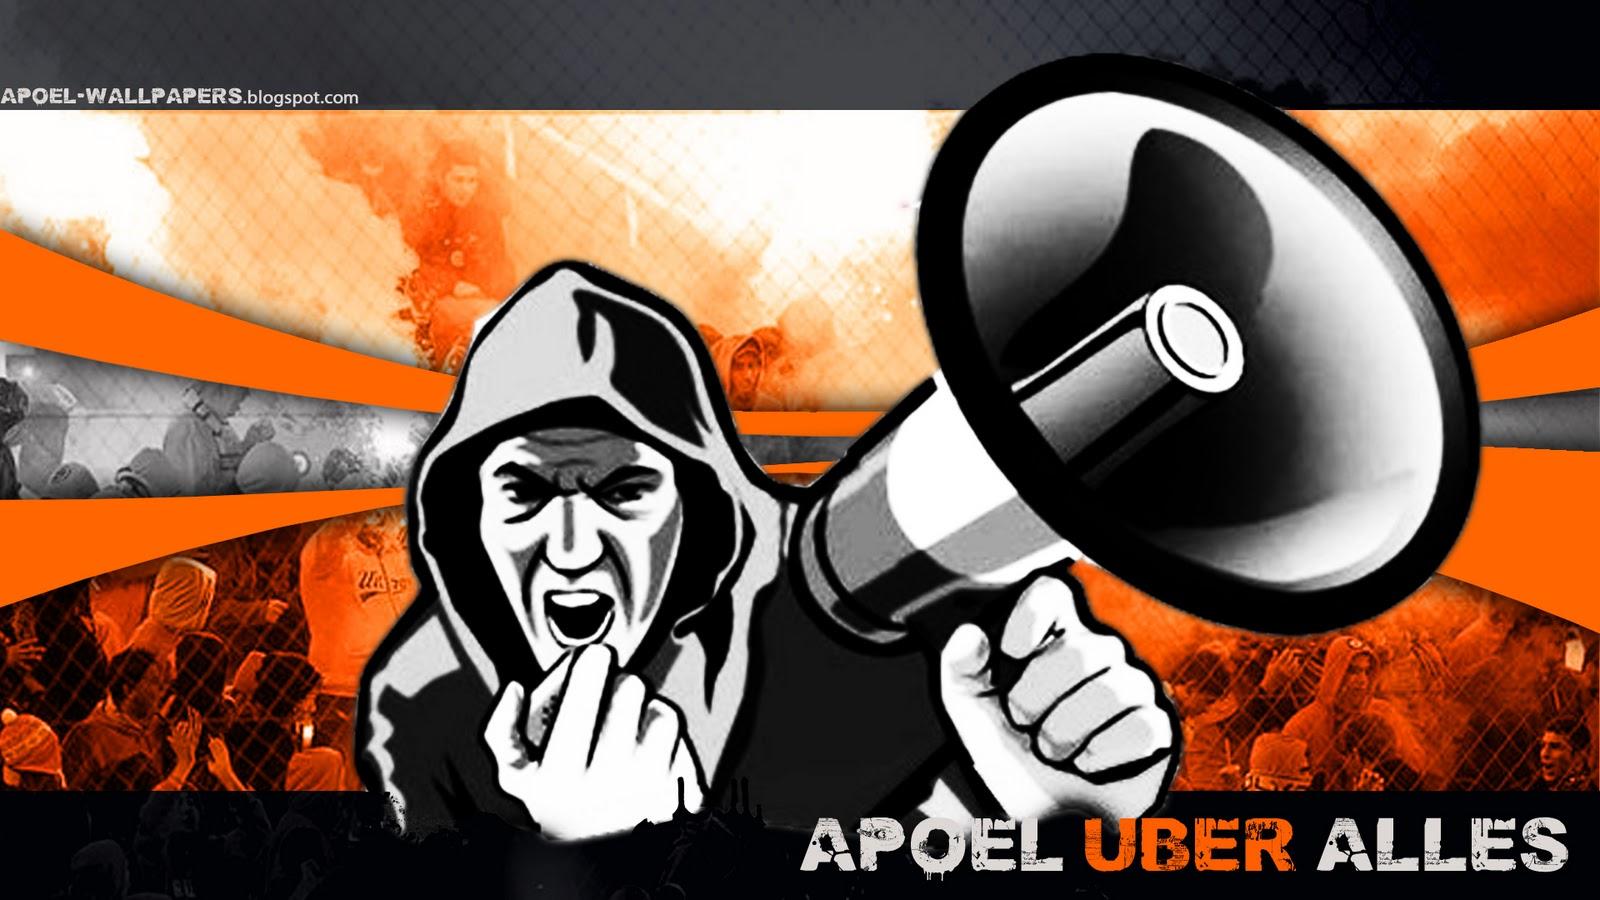 http://3.bp.blogspot.com/-w0gGiRwkWEo/Tnxzd0kROMI/AAAAAAAAA7Y/OX7evJTKn7w/s1600/Uber-alles.jpg